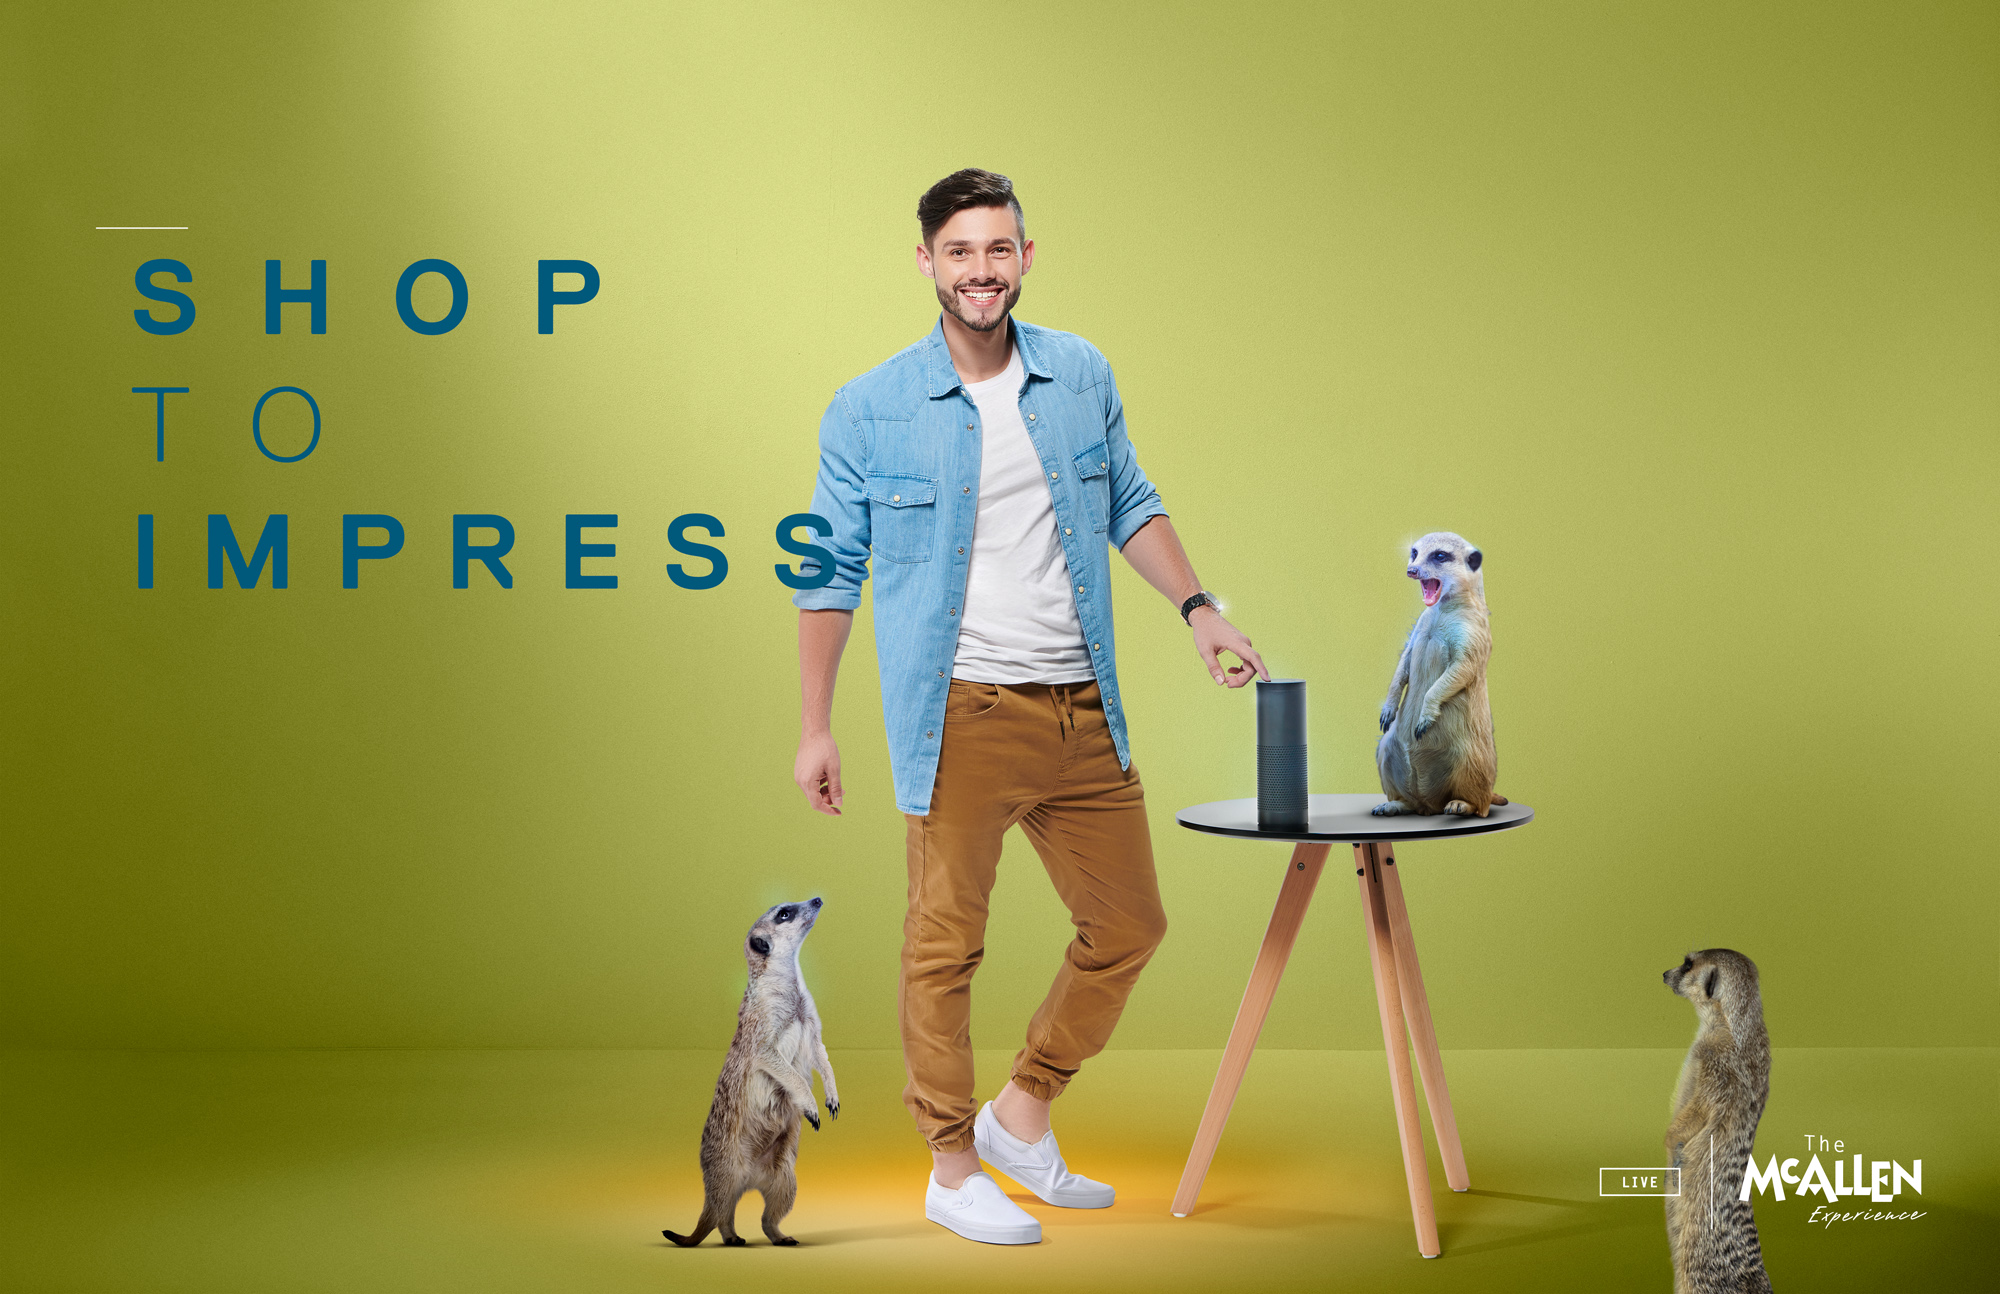 Shop to impress.jpg